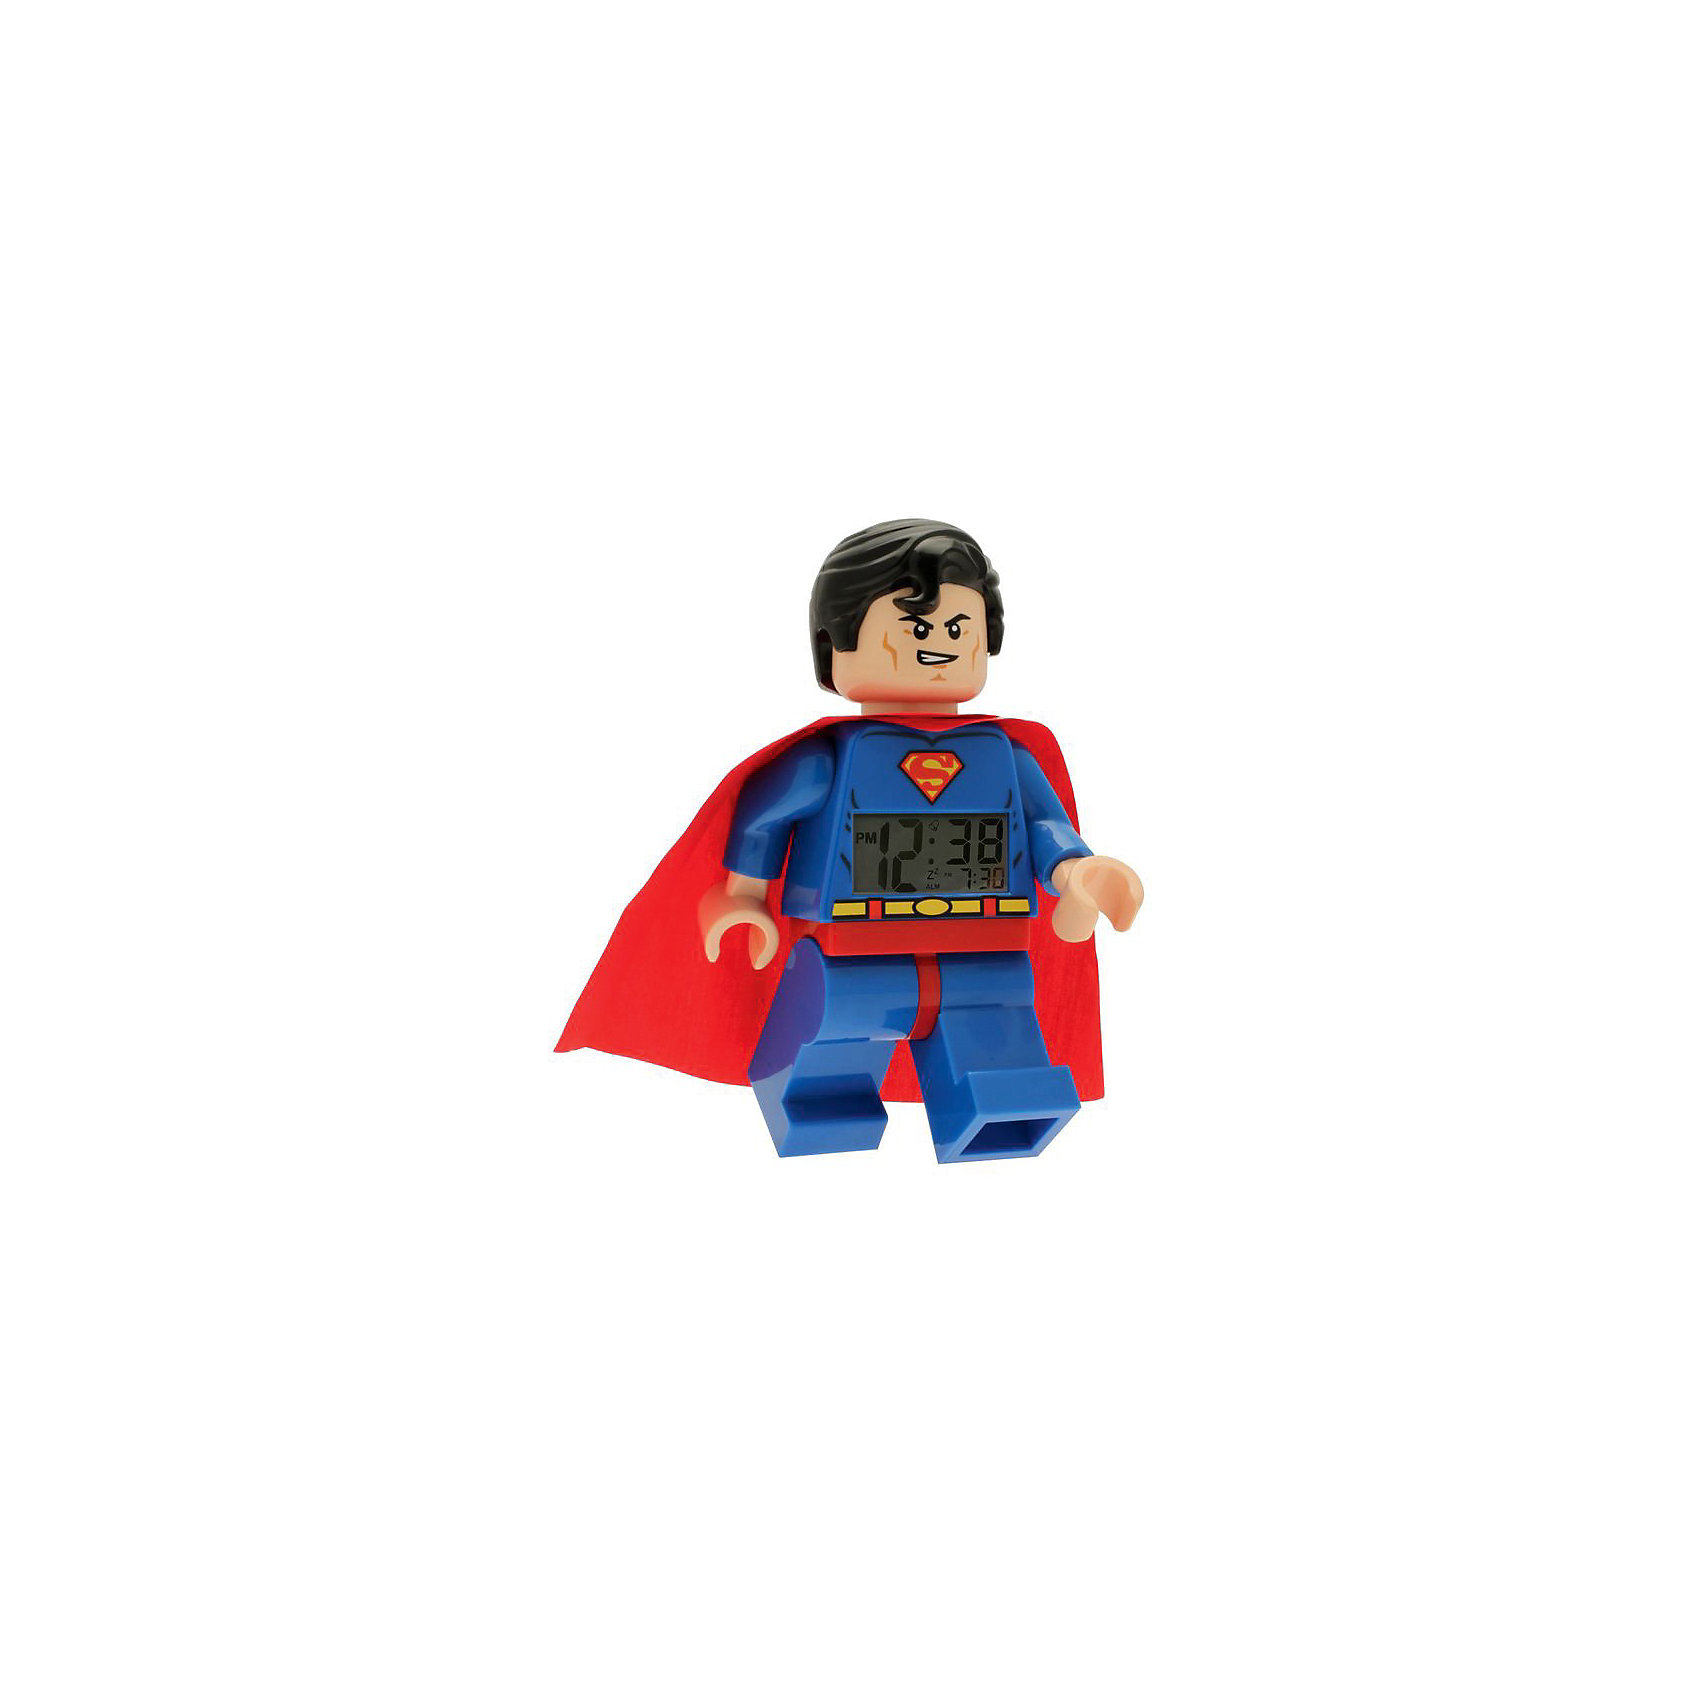 LEGO Будильник-игрушка Супер Герои, LEGO